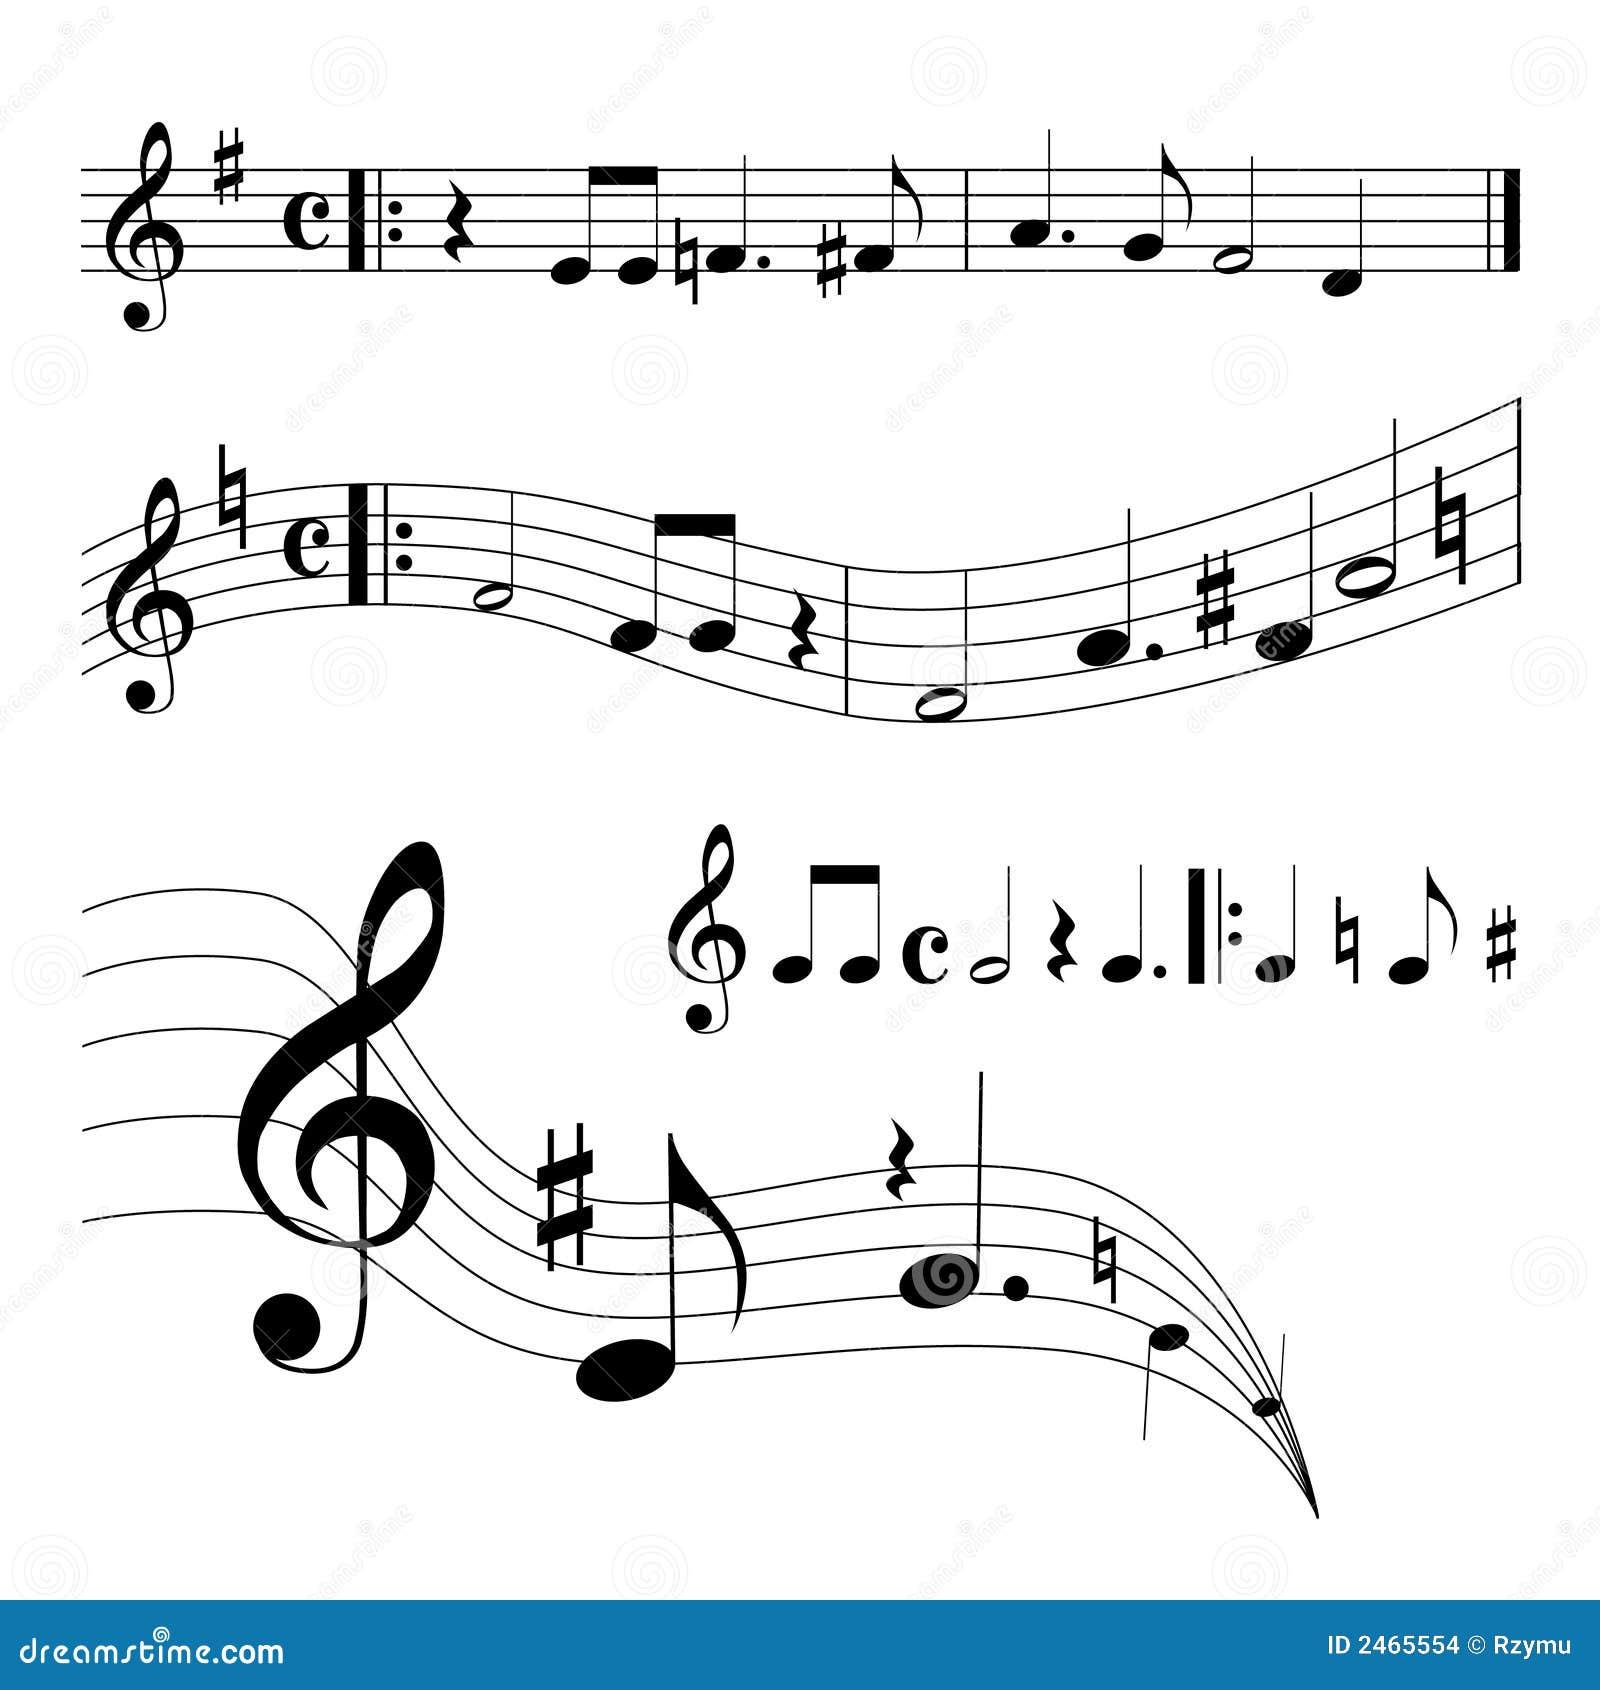 Music Sheet Stock Vector. Illustration Of Clef, Harmony